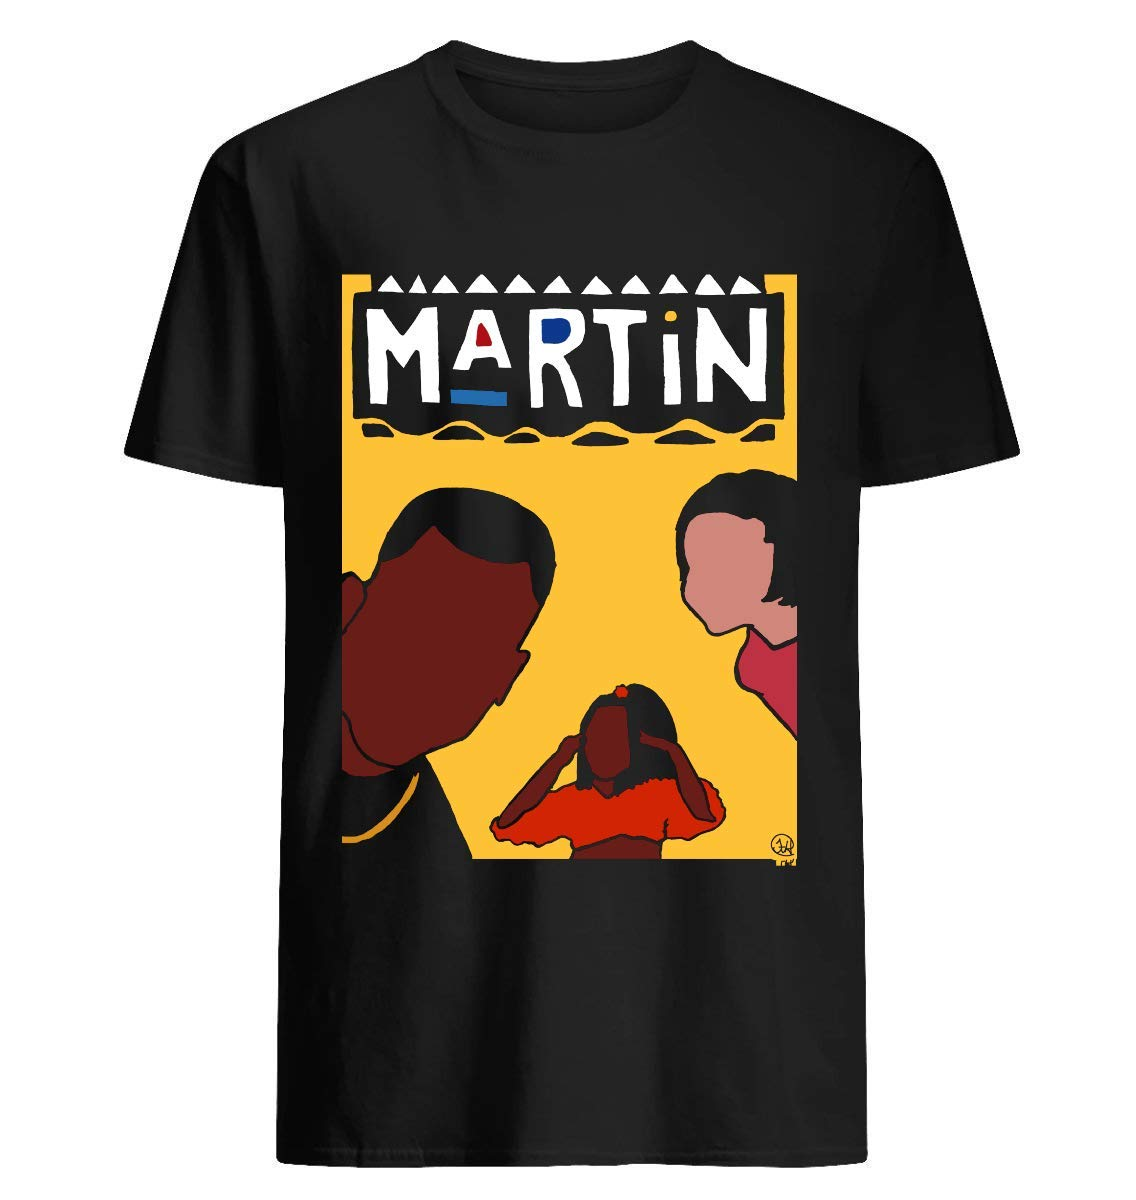 Martin - Yellow - Short Sleeve T Shirt, For Unisex